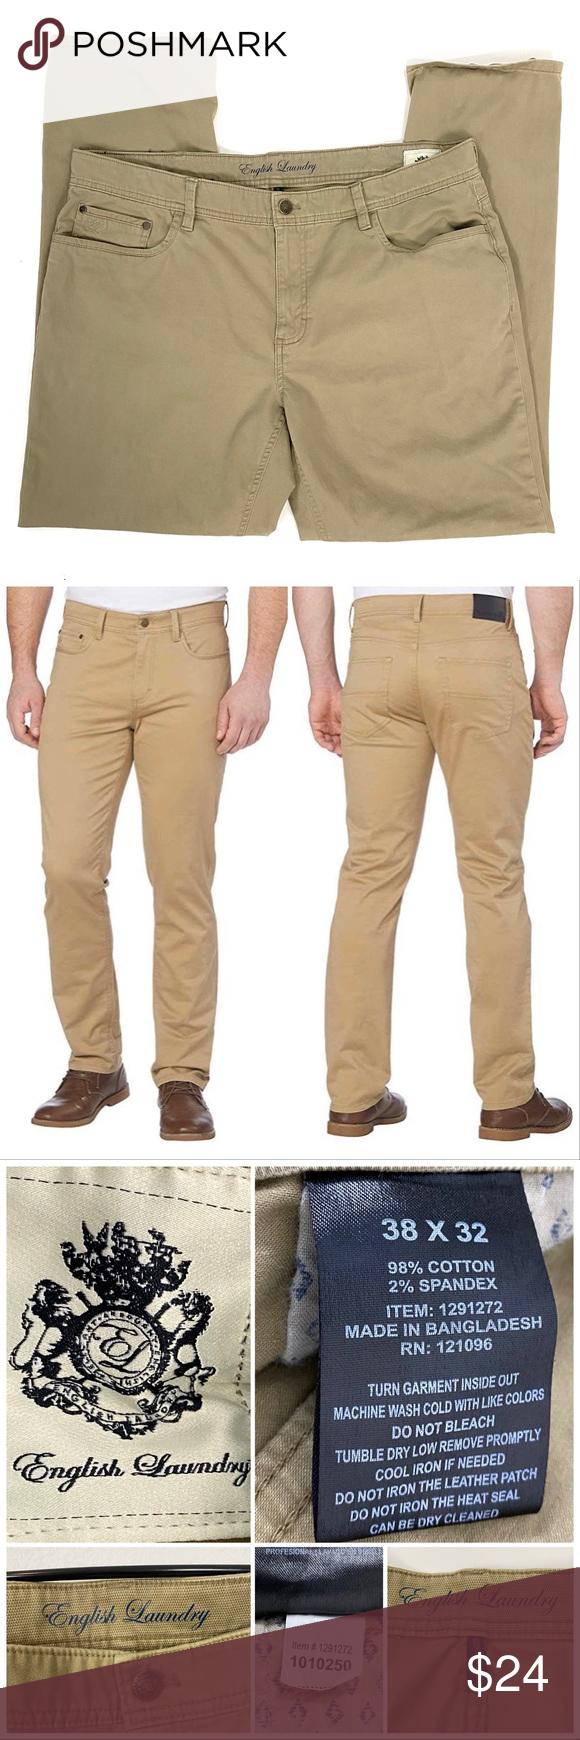 English Laundry 38x32 5 Pocket Pants Sand Dune Pocket Pants